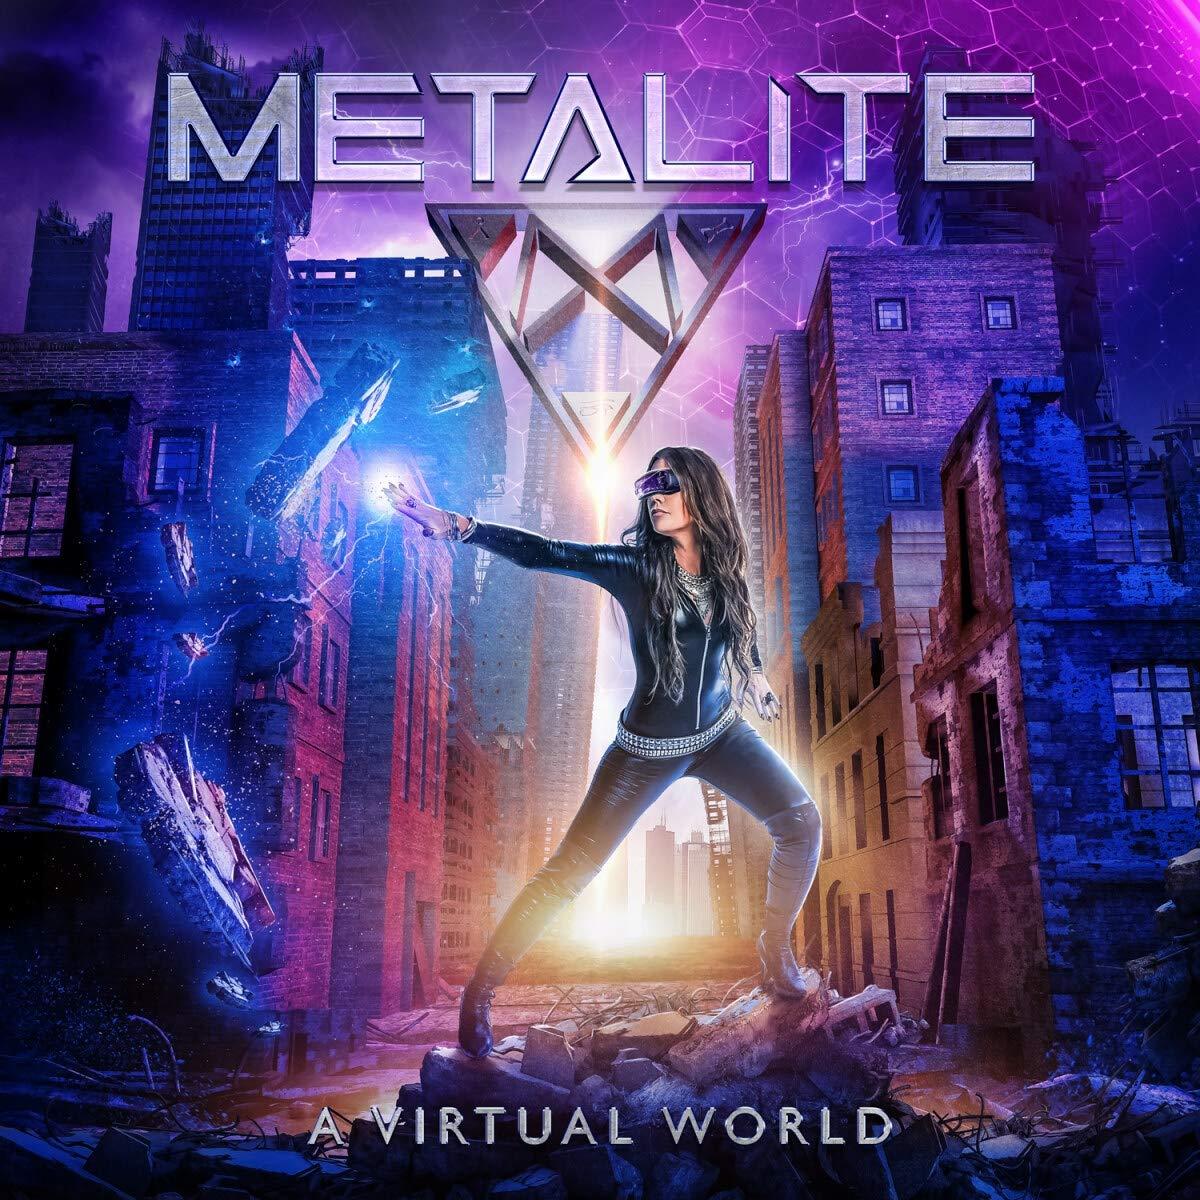 Metalite - A Virtual World (2021) [FLAC] Download